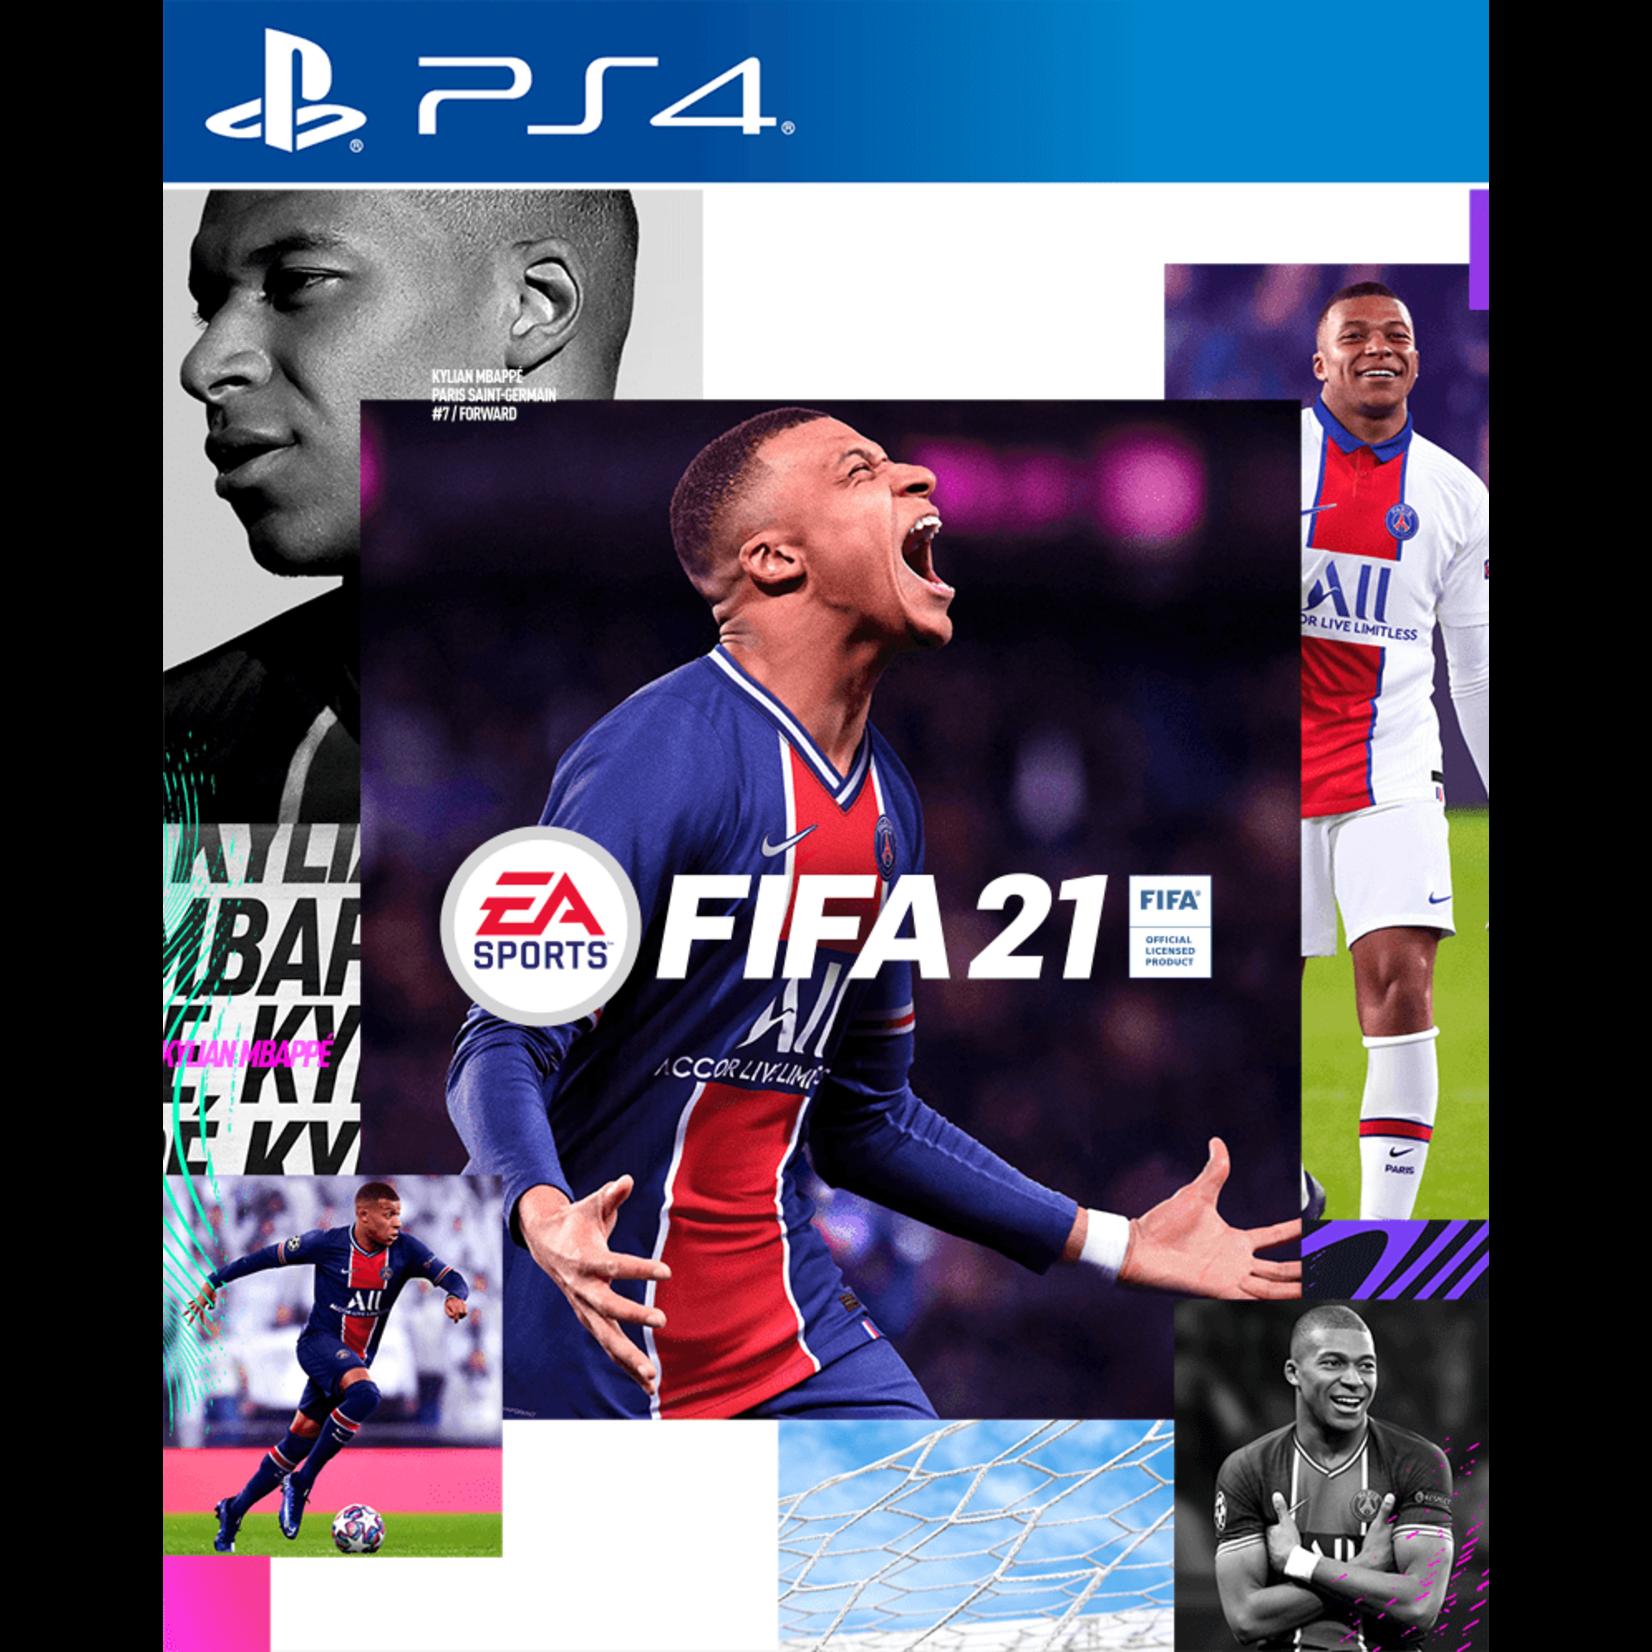 PS4-Fifa 21